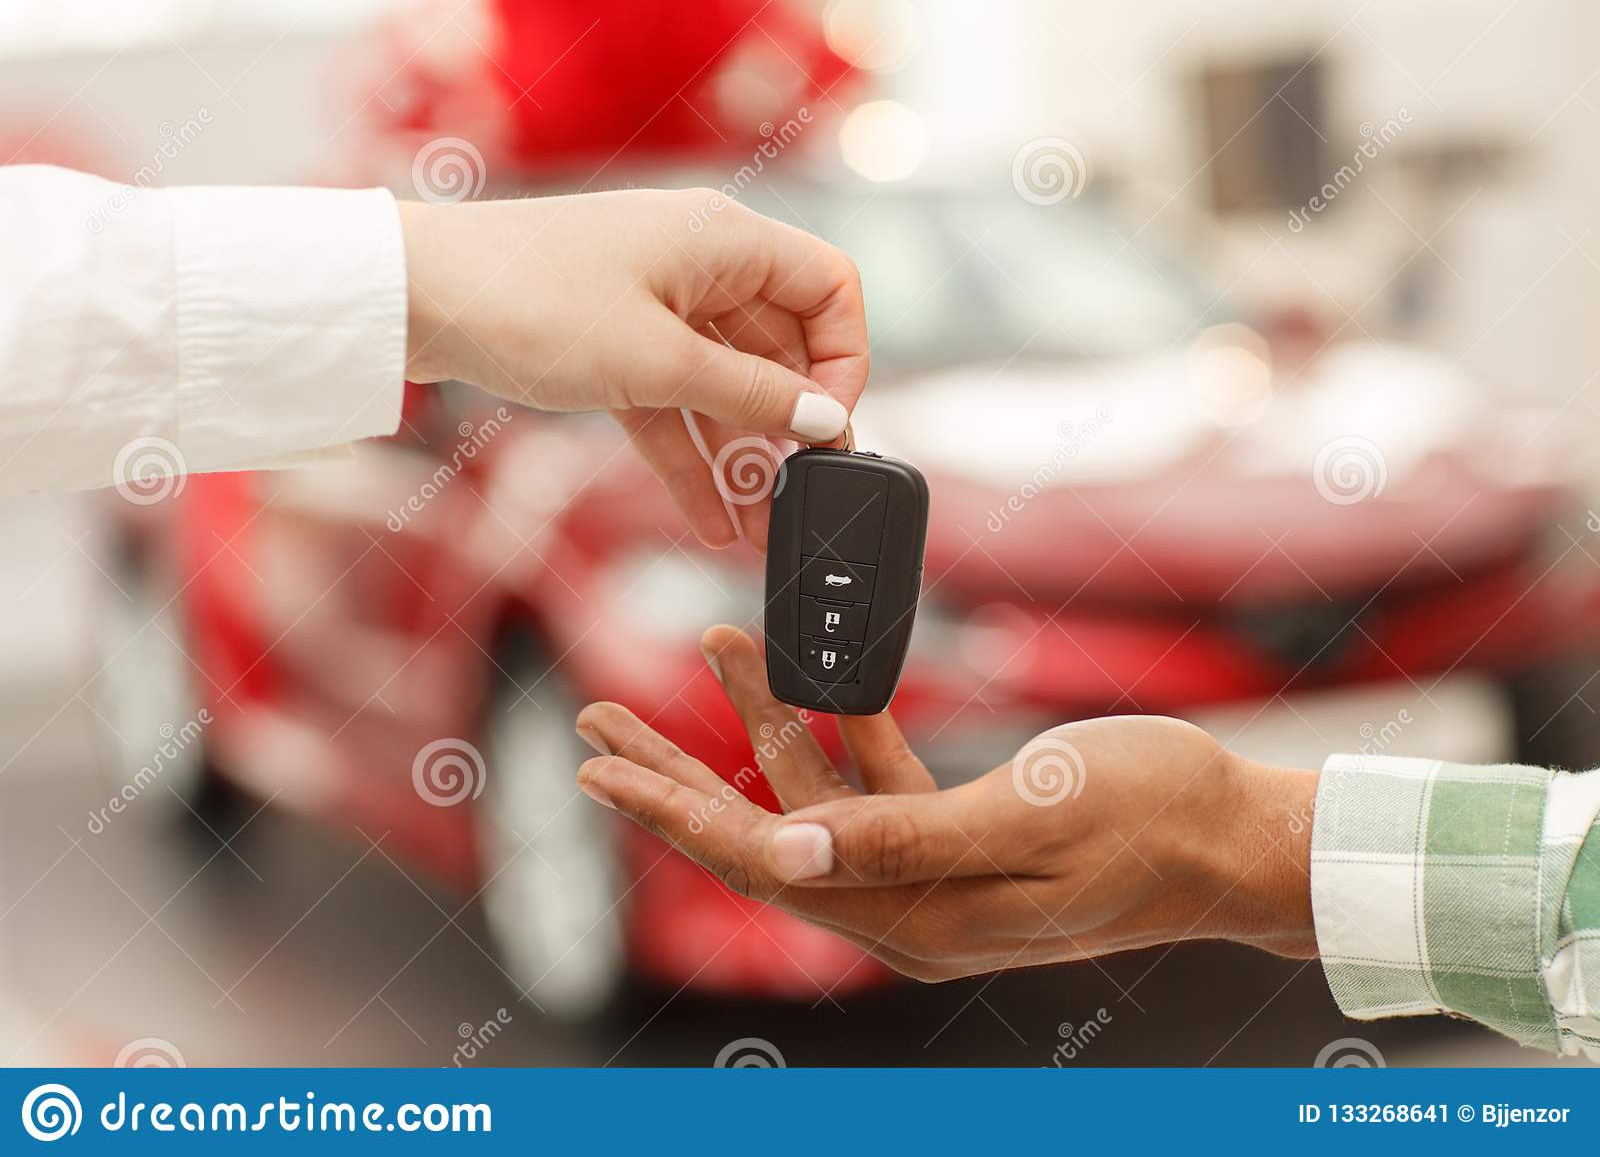 African man receiving car keys from saleswoman